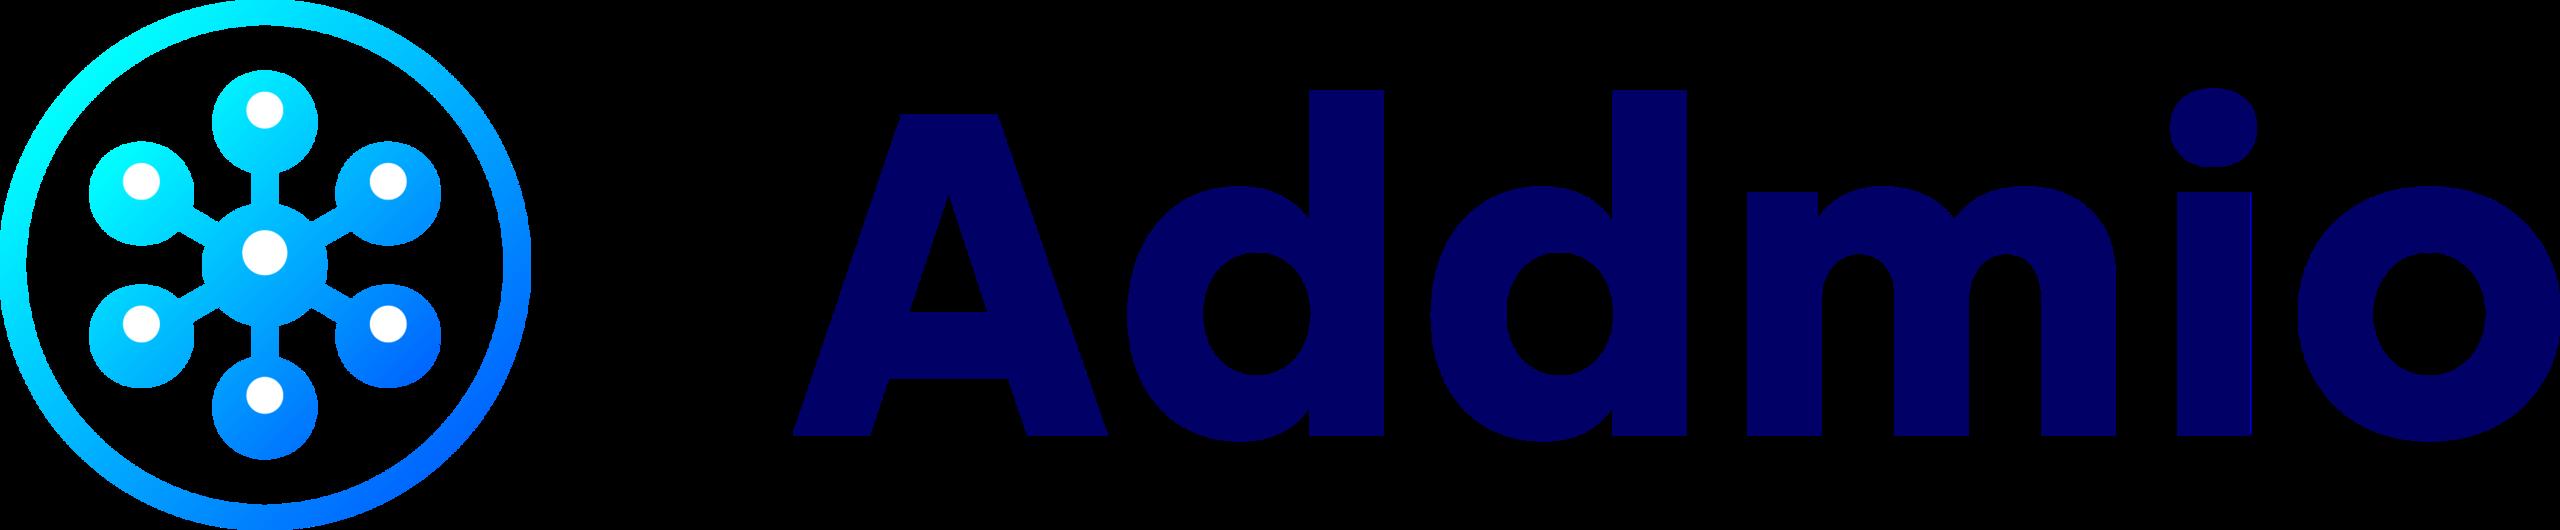 Addmio logo square blue